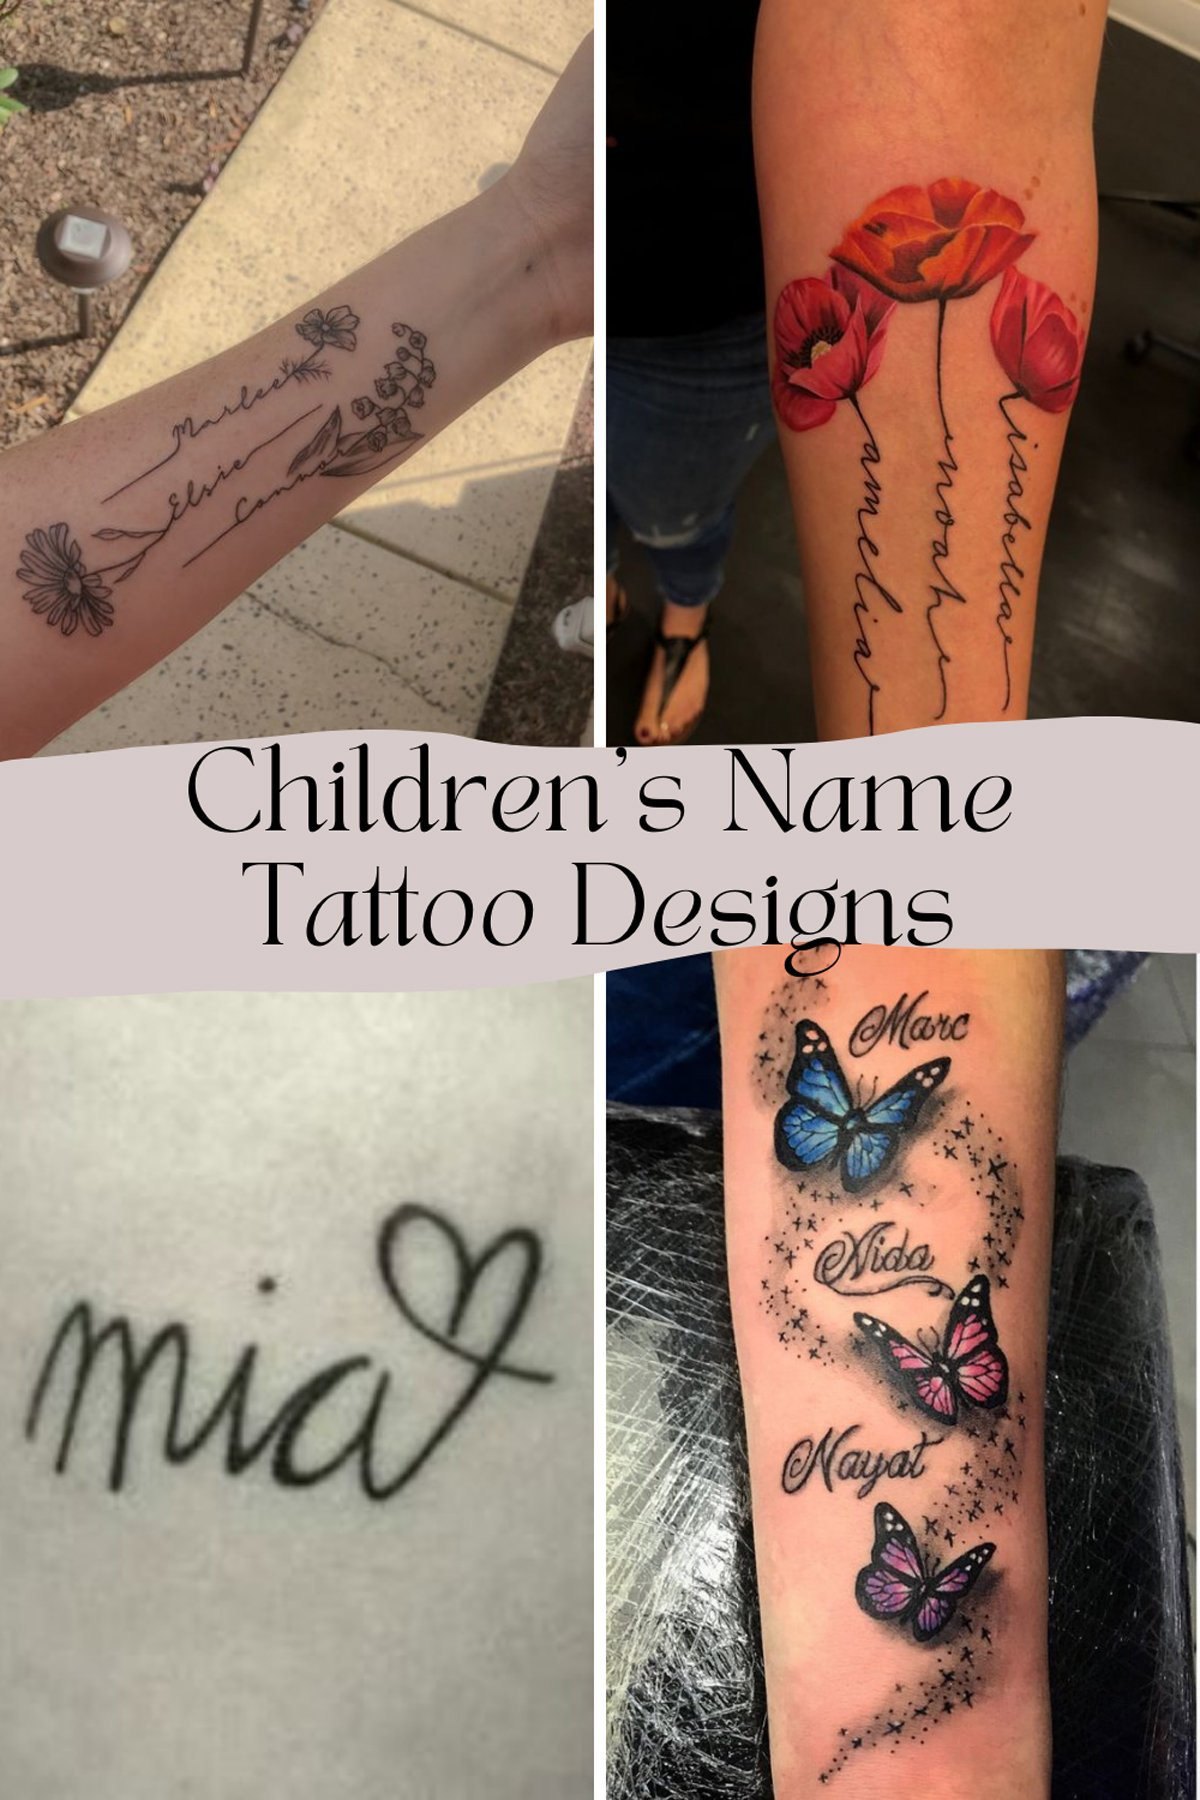 Childrens Name Tattoo Designs